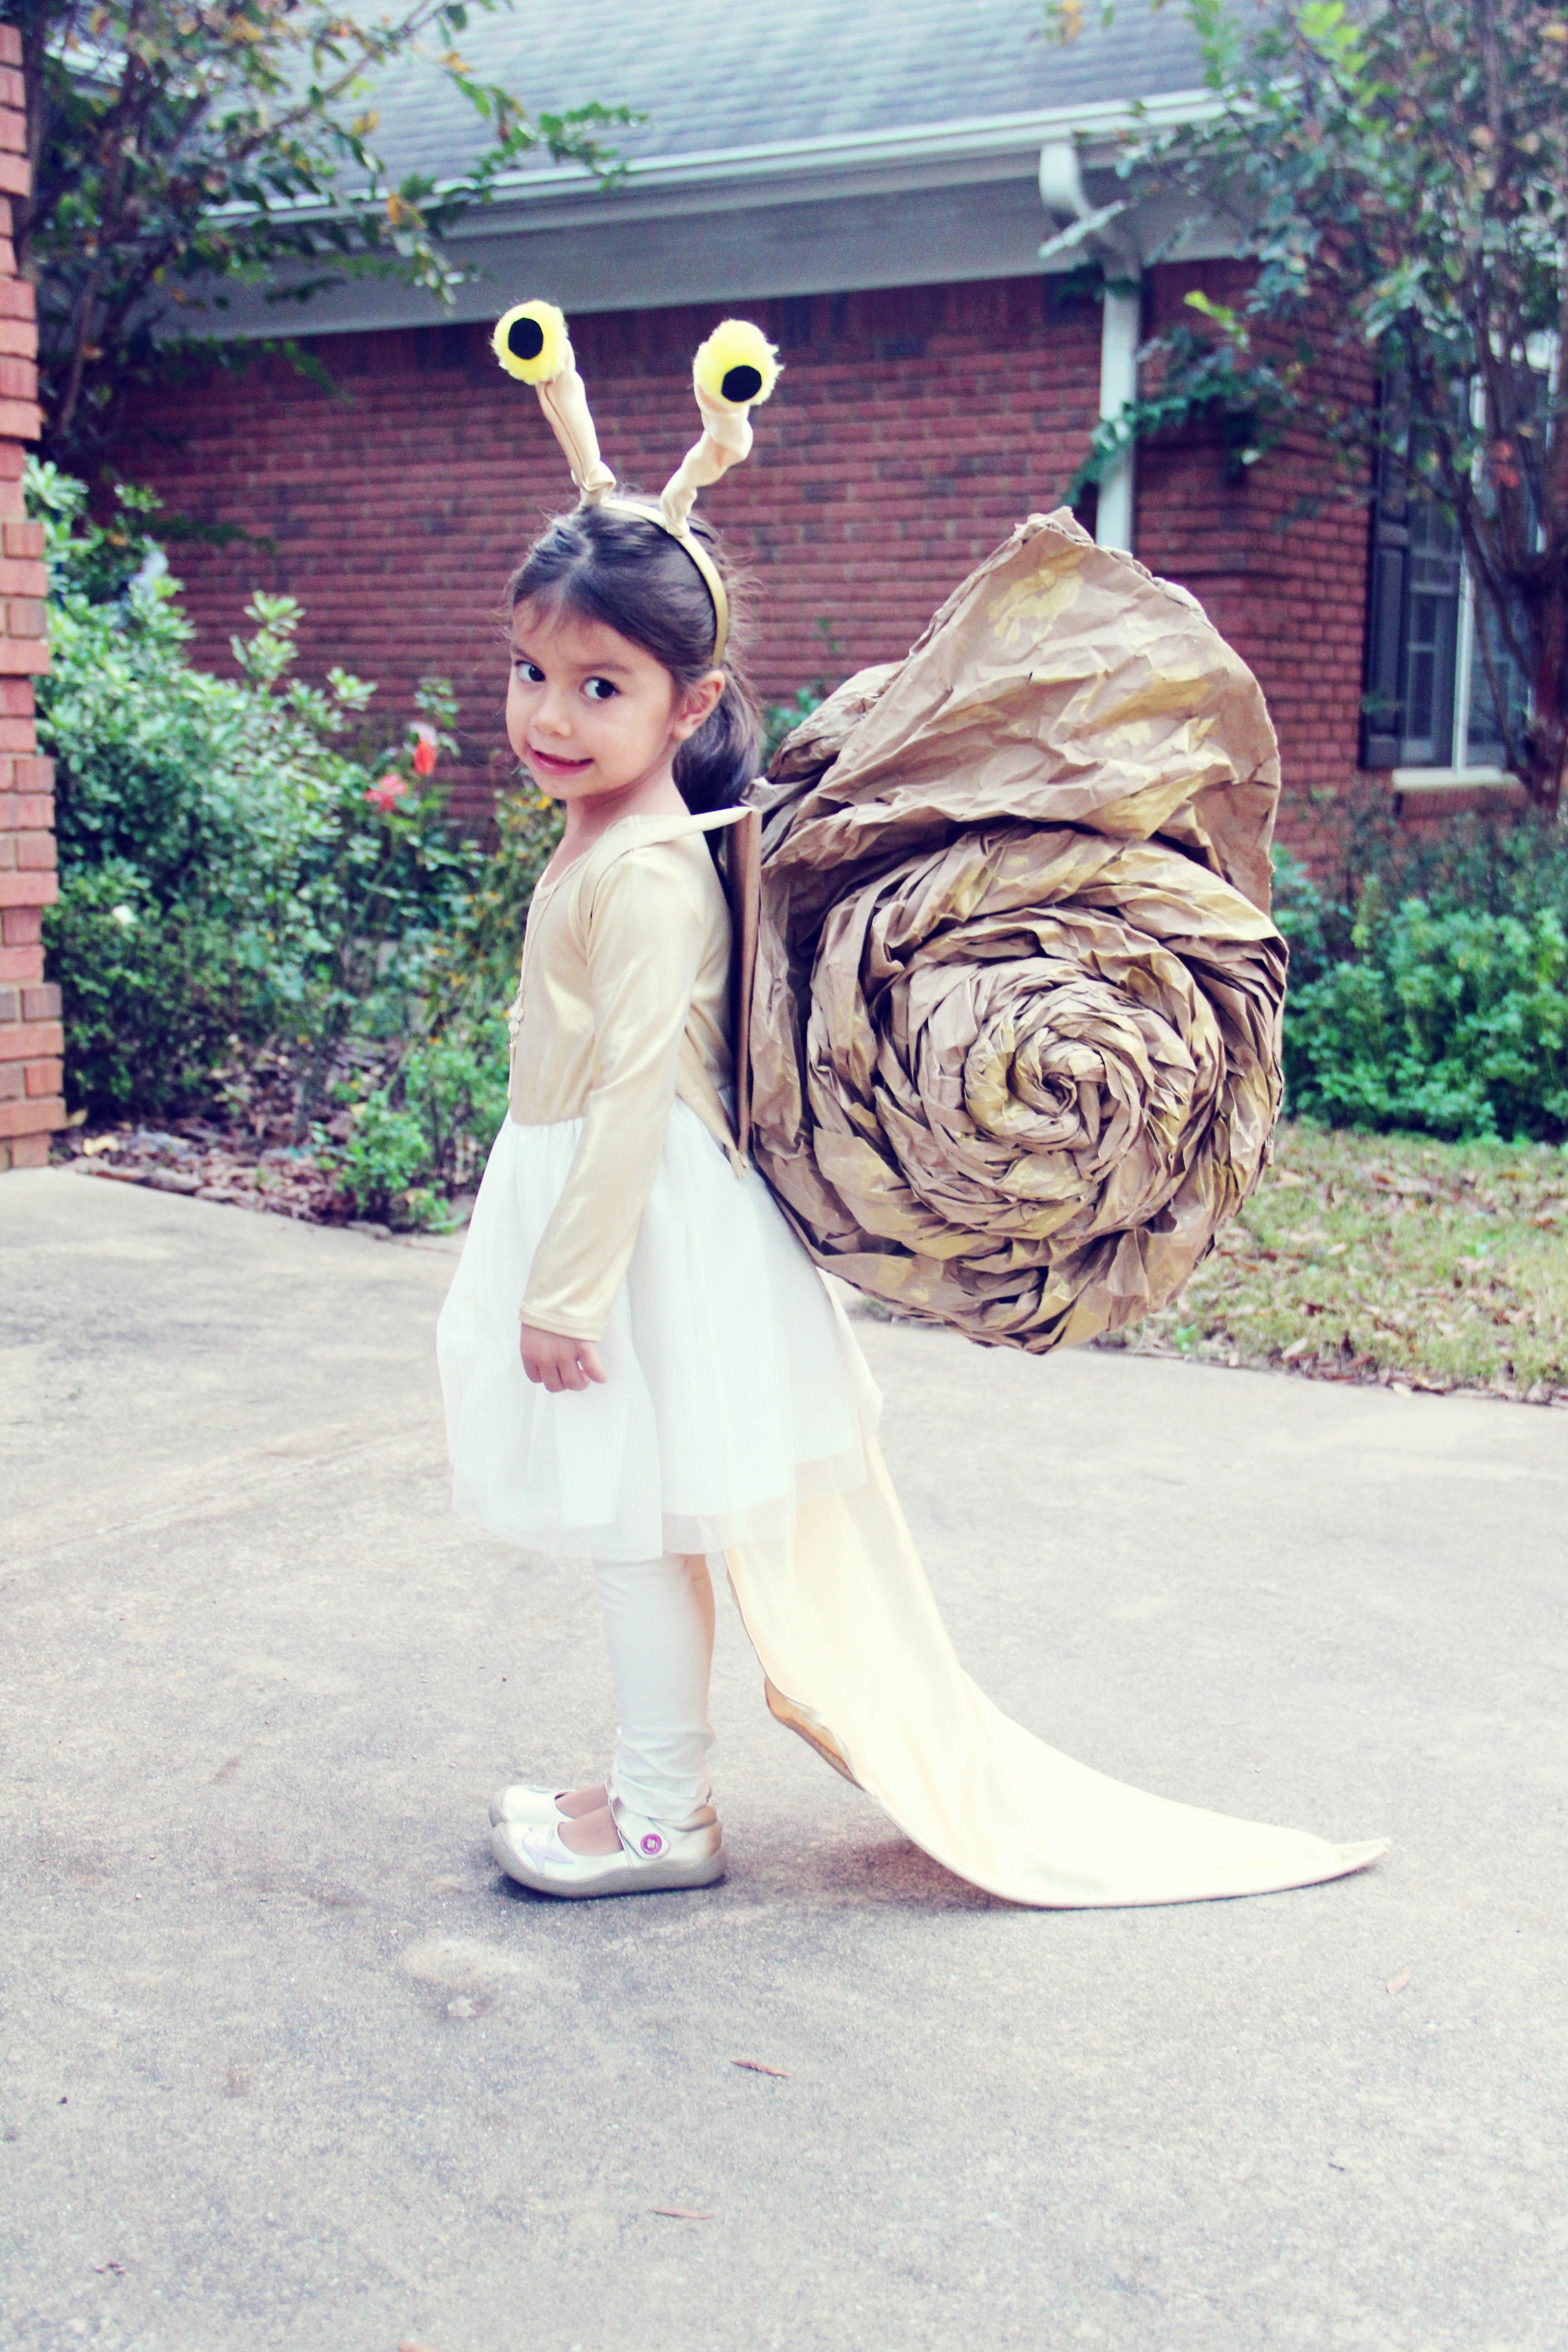 Snail costume u פורים pinteu